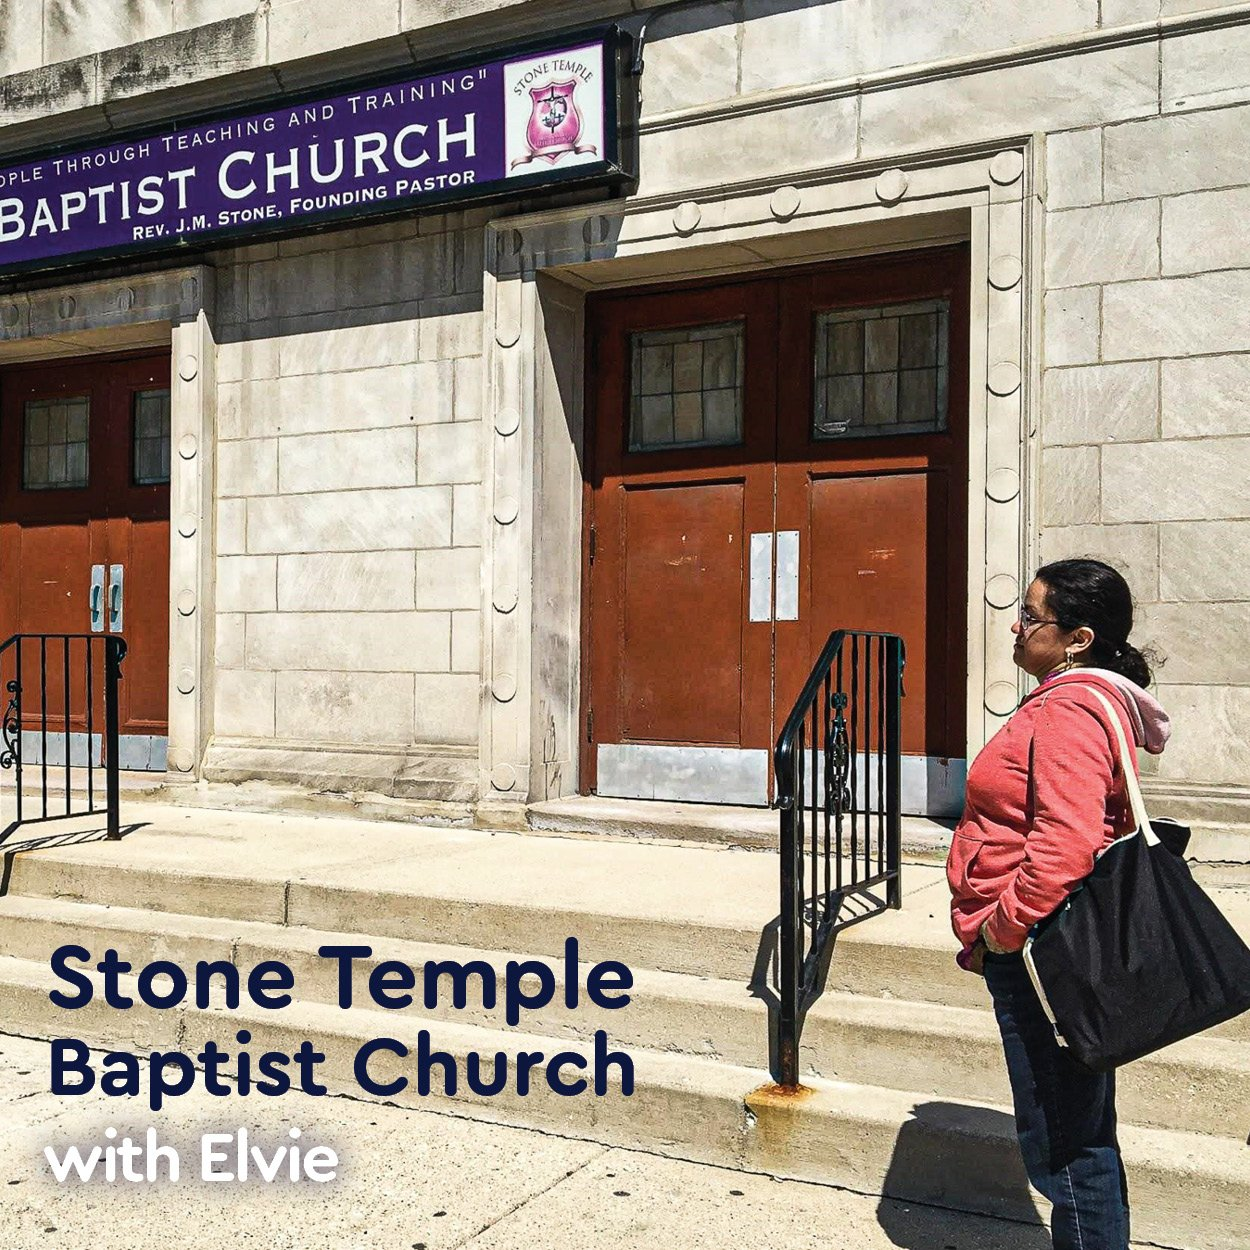 Elvy at Stone Temple Baptist Church